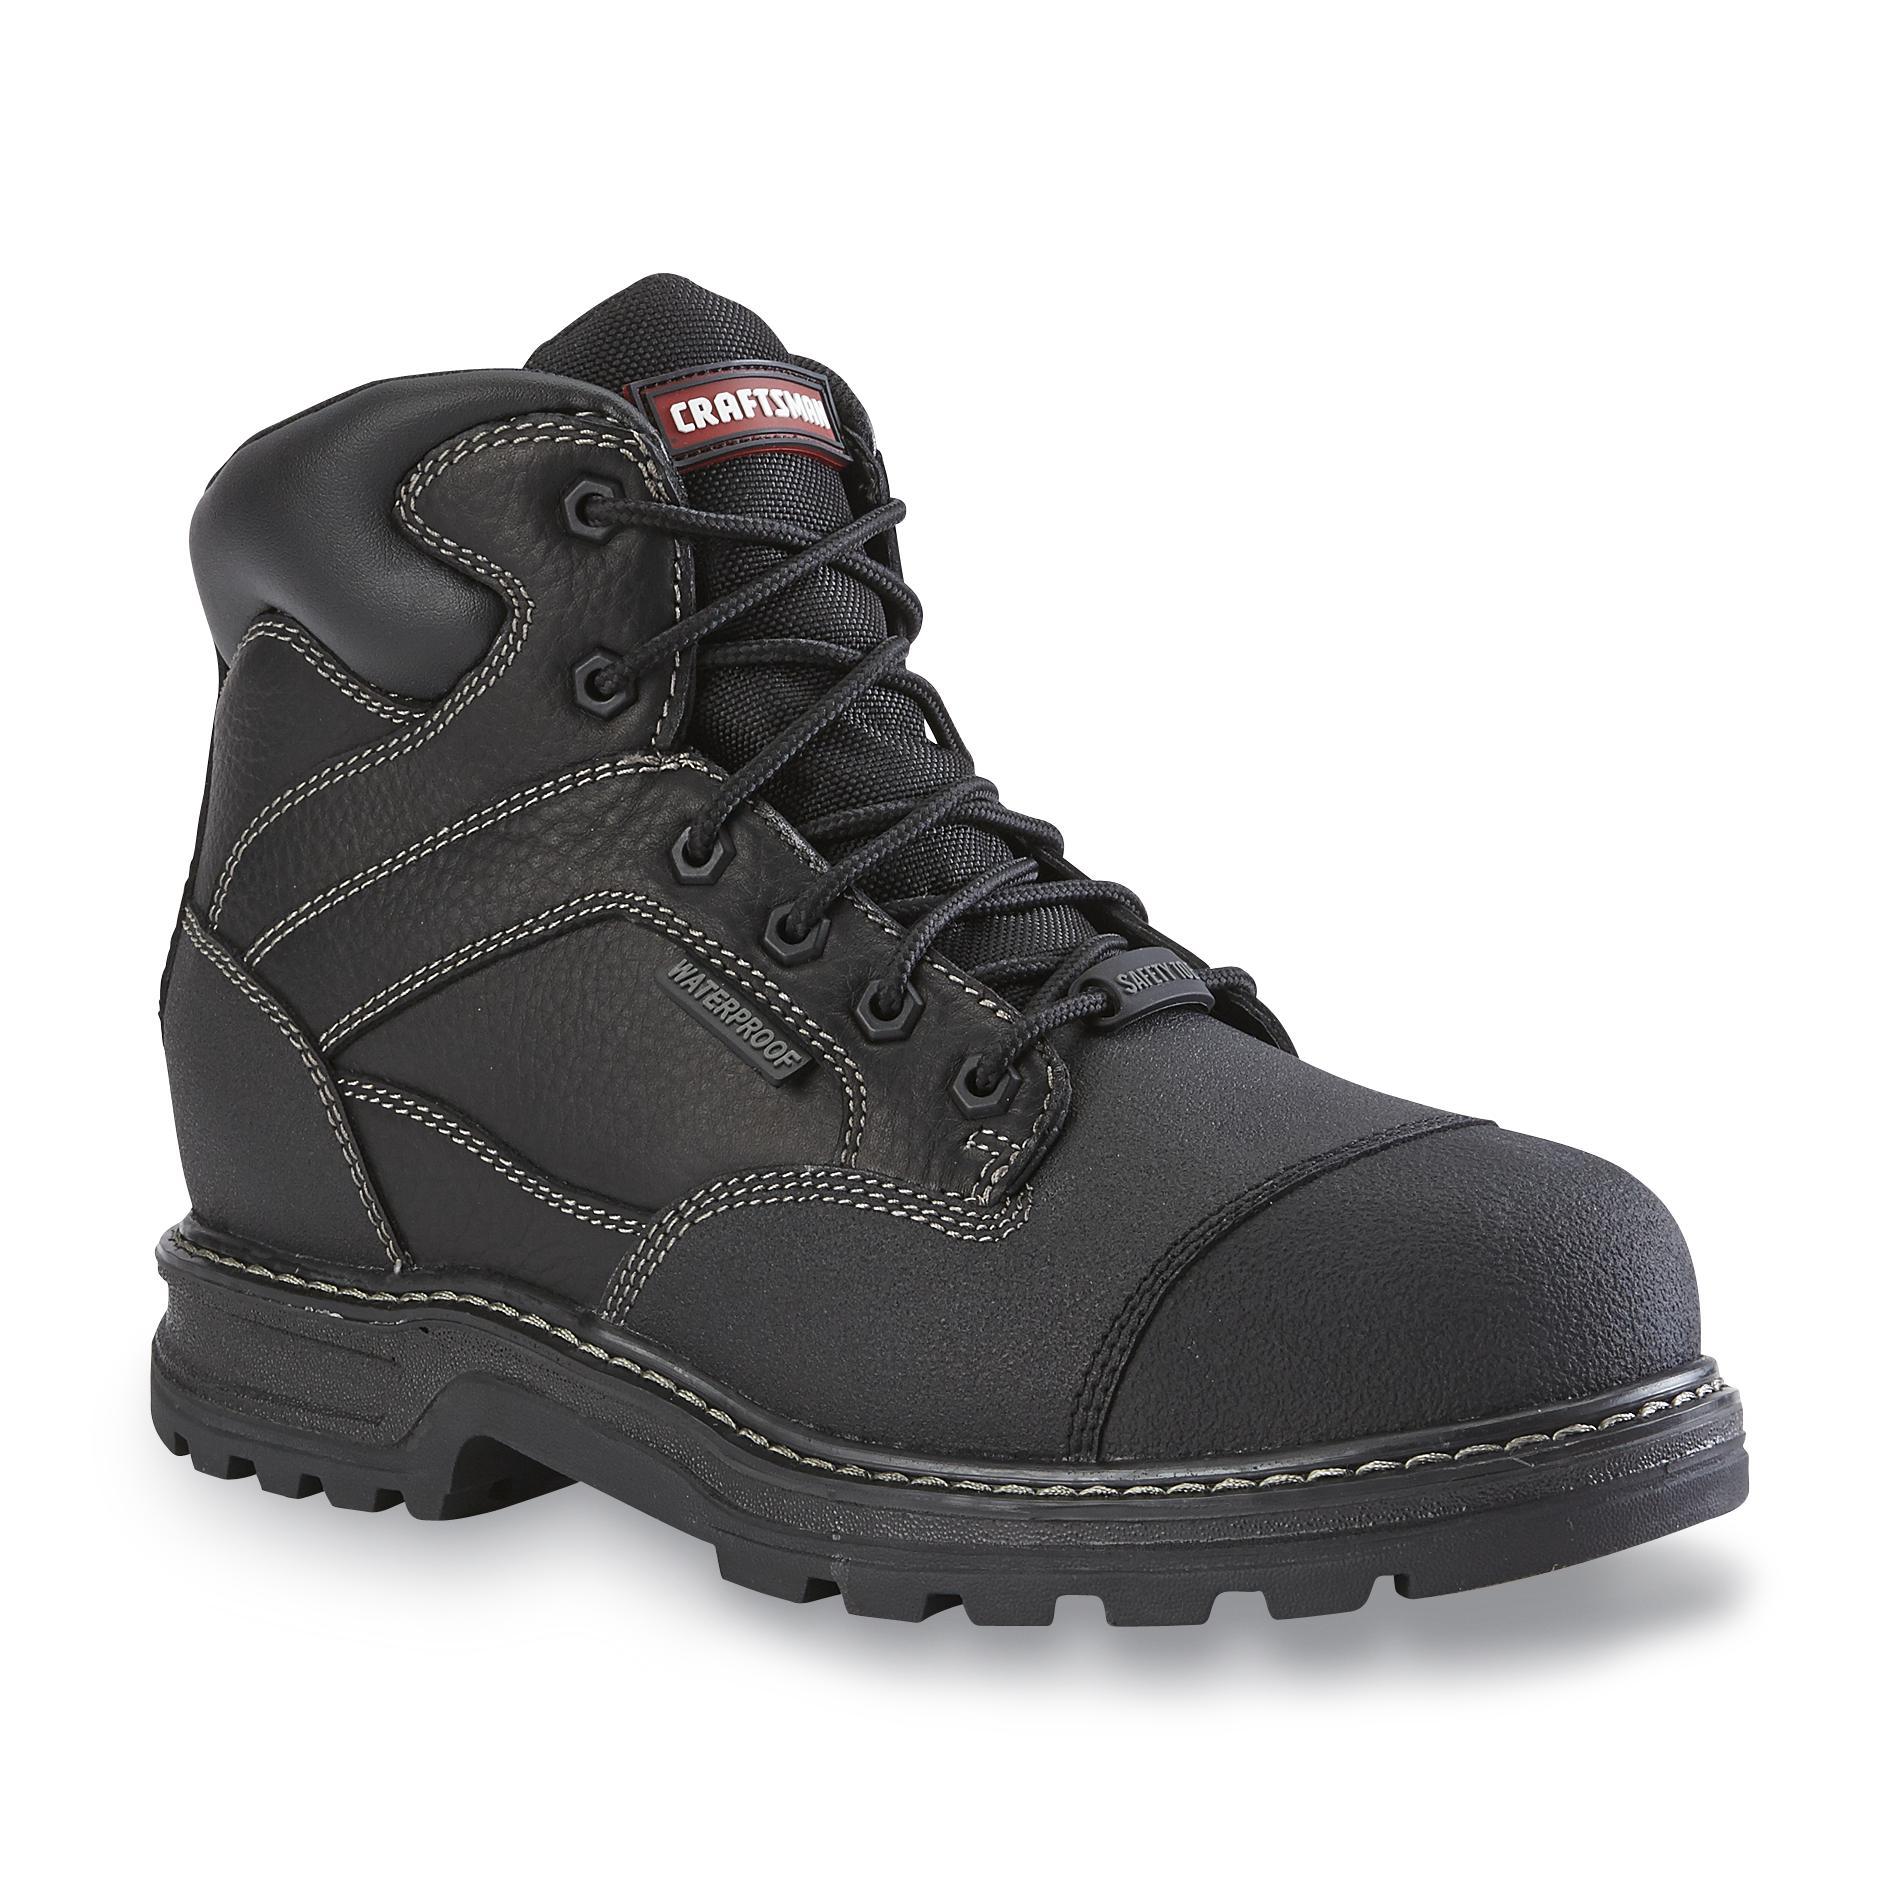 Craftsman Men's Theo Black Waterproof Steel-Toe Work Boot - Wide Width